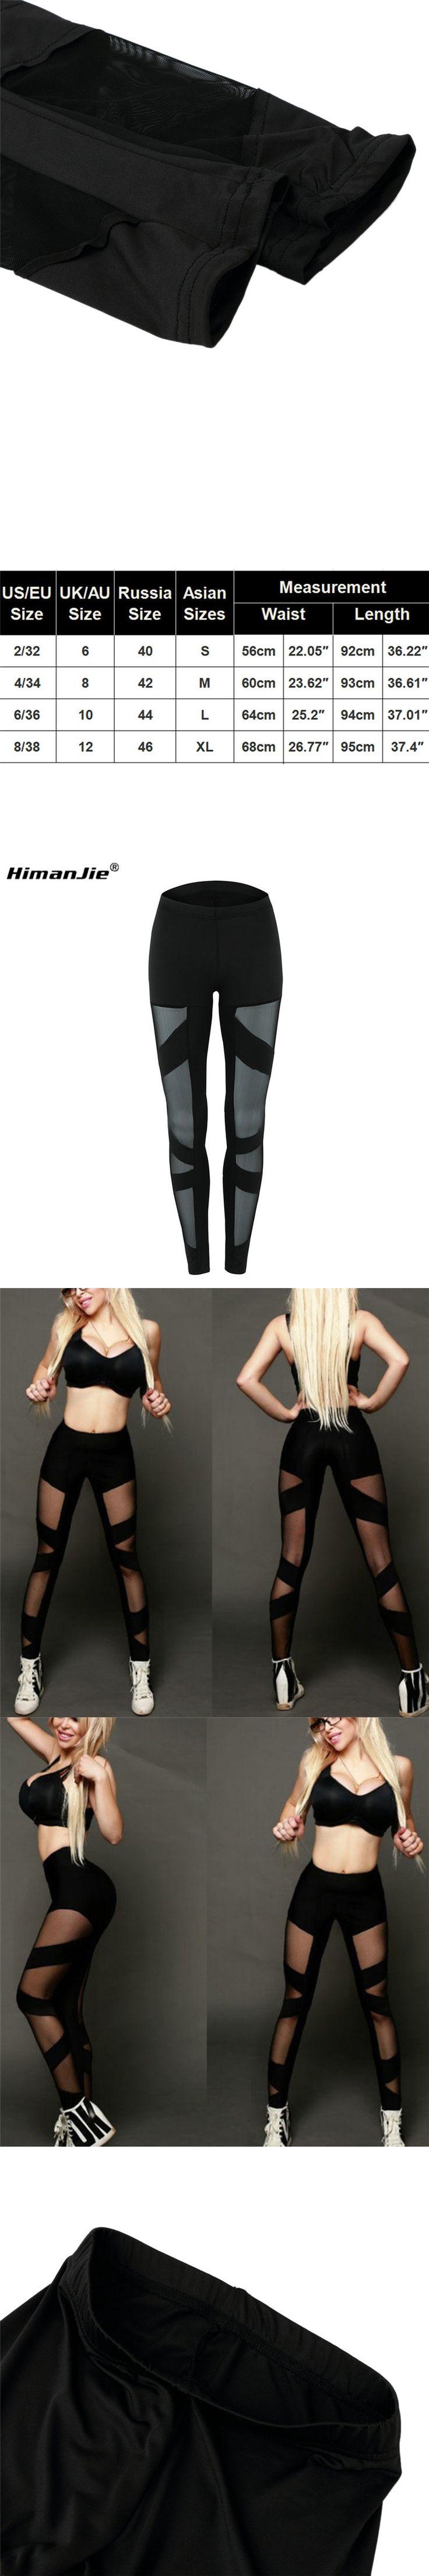 Mermaid Curve Women Sport Fitness Leggings Elastic Gym Capris hollow out Tight Leggings Coast the same style Yoga pants